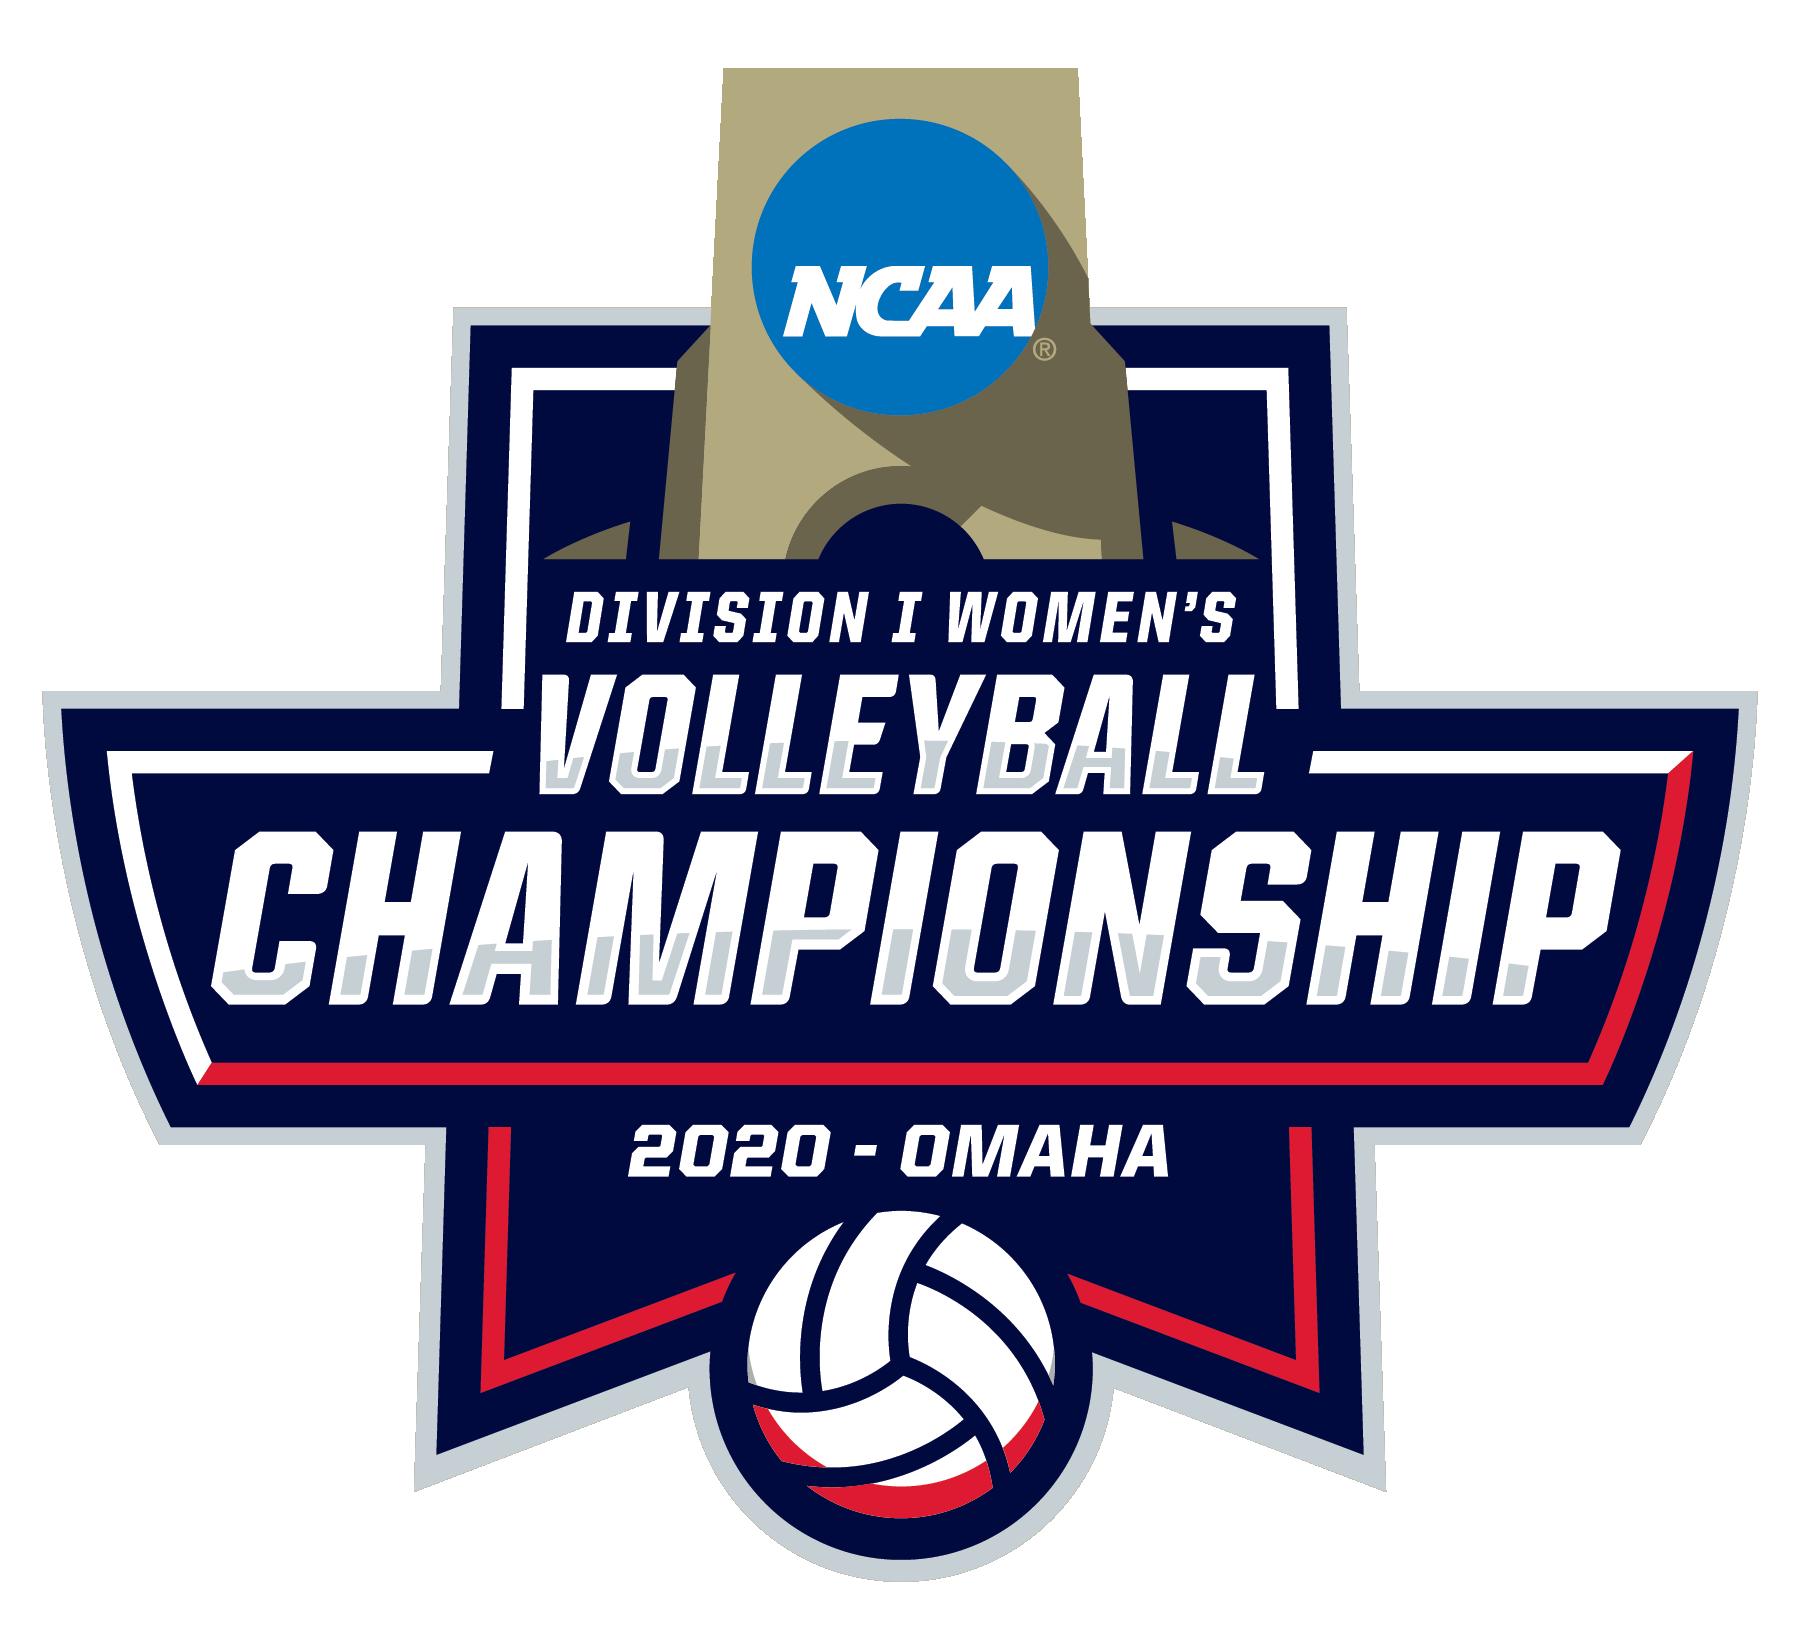 2020 DI Women's Volleyball Championship